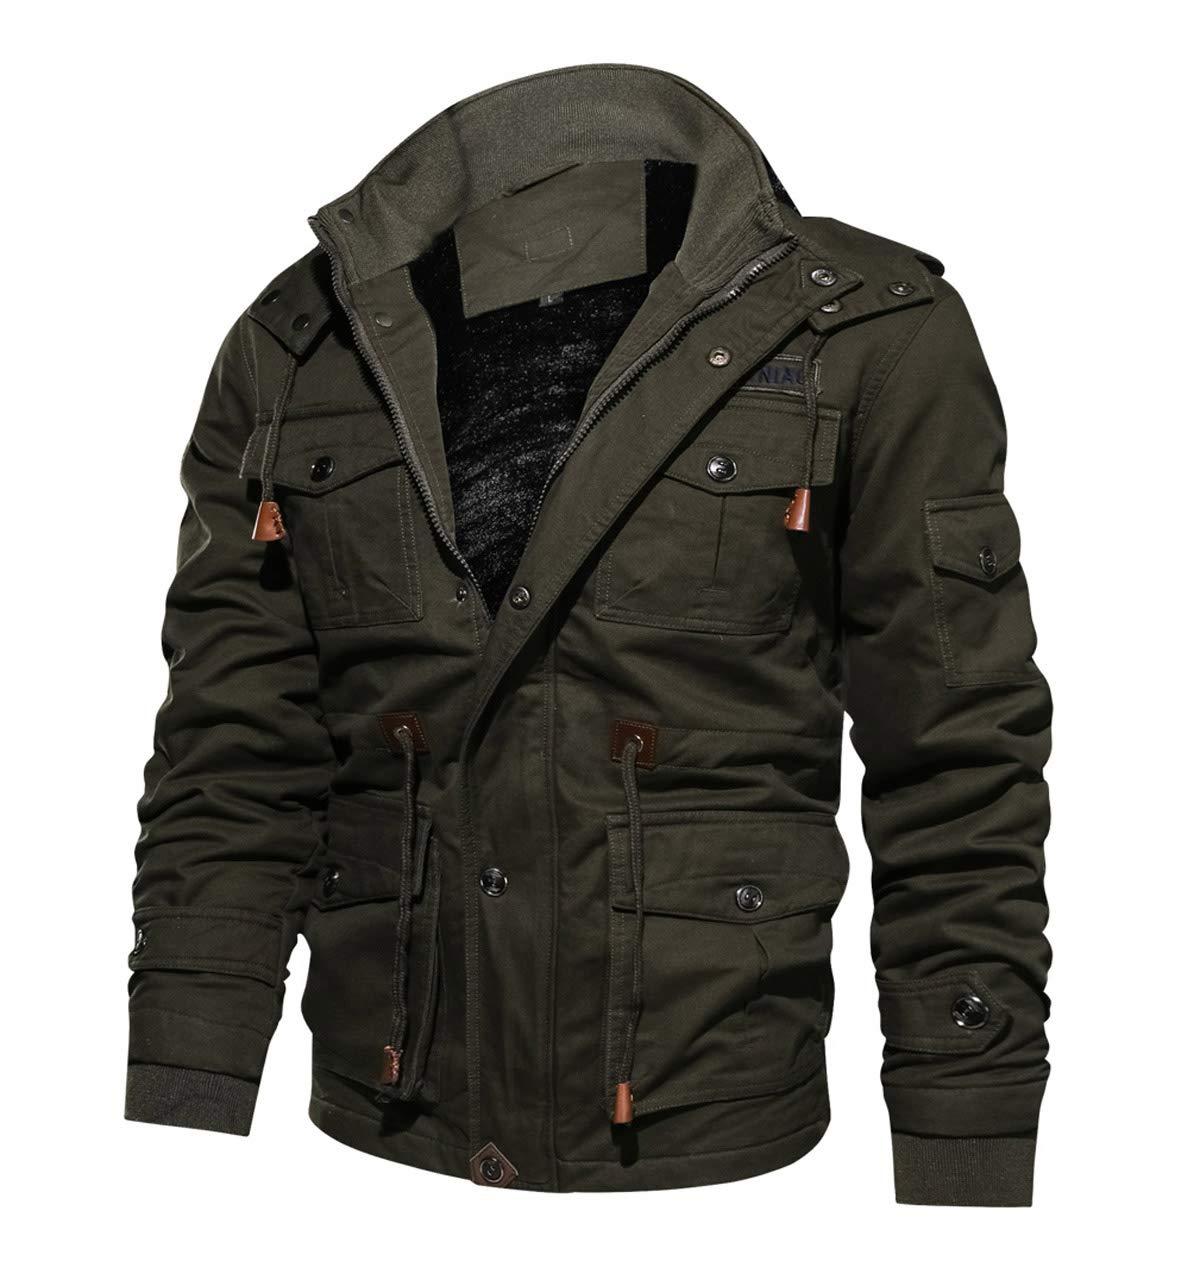 CRYSULLY Men's Multi Cargo Pocket Tactical Safari Jacket Fall Cotton Field Fleece Jacket Army Green by CRYSULLY